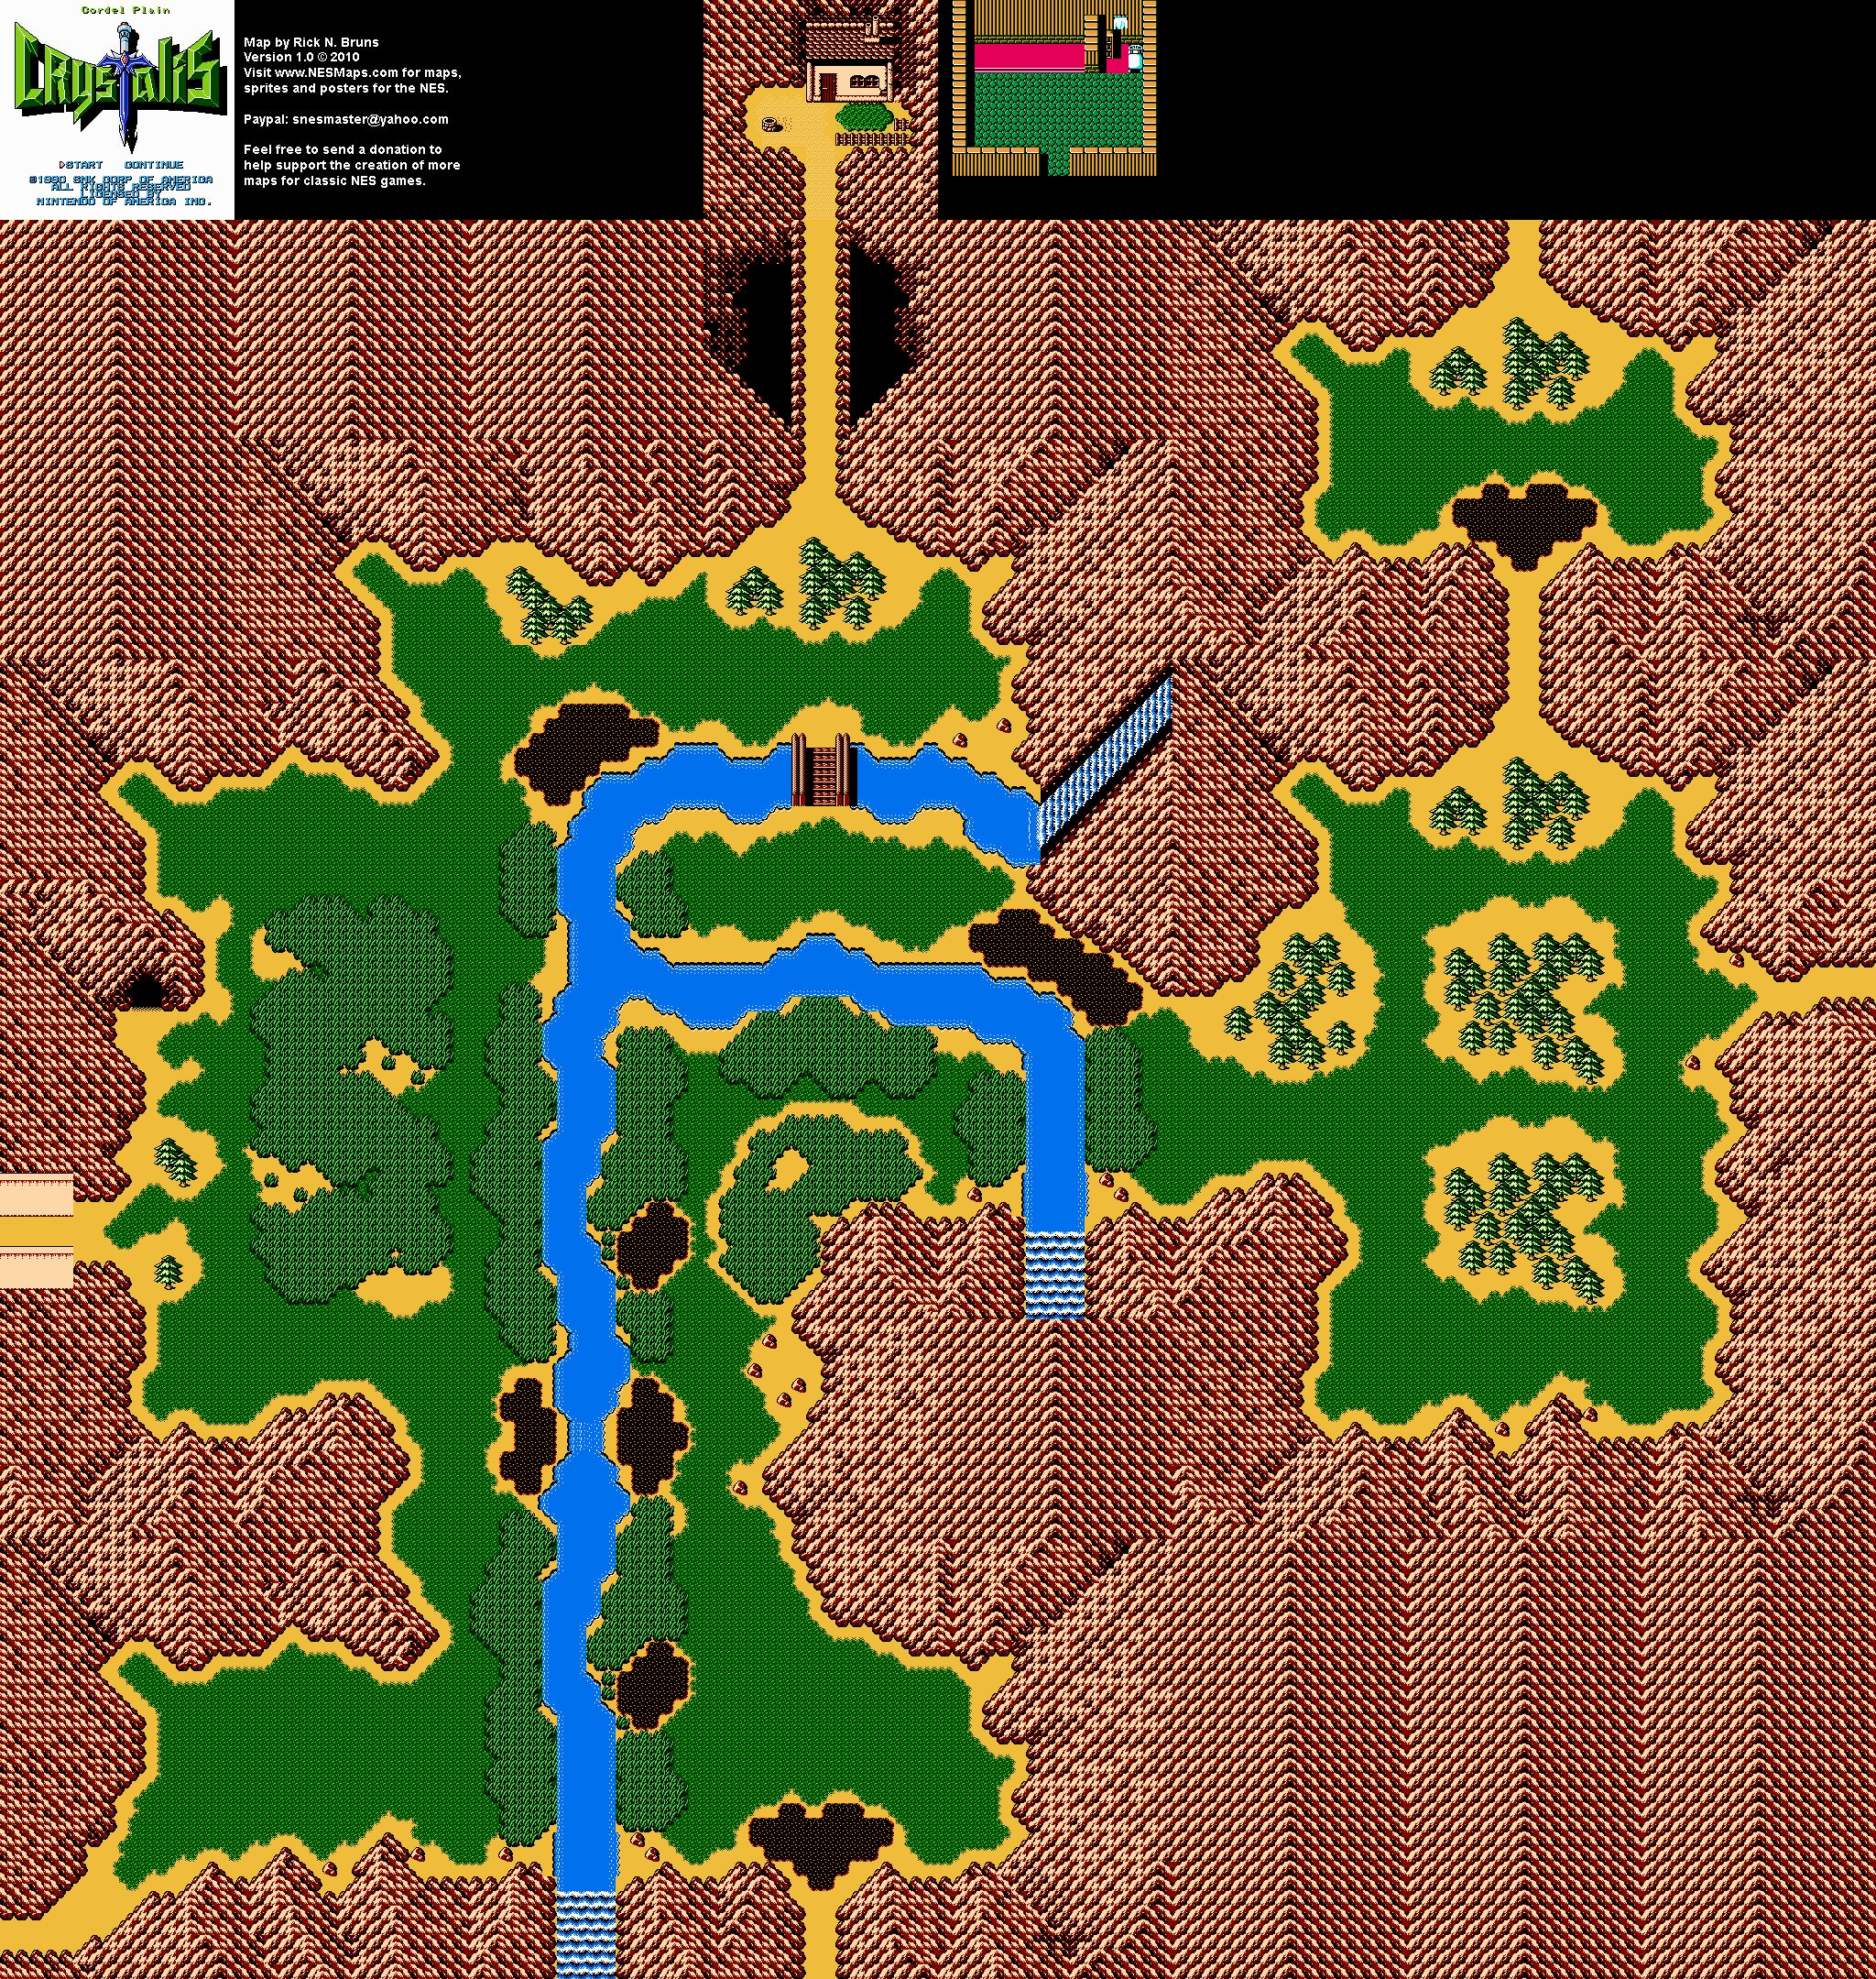 Crystalis - Cordel Plain Nintendo NES Map BG